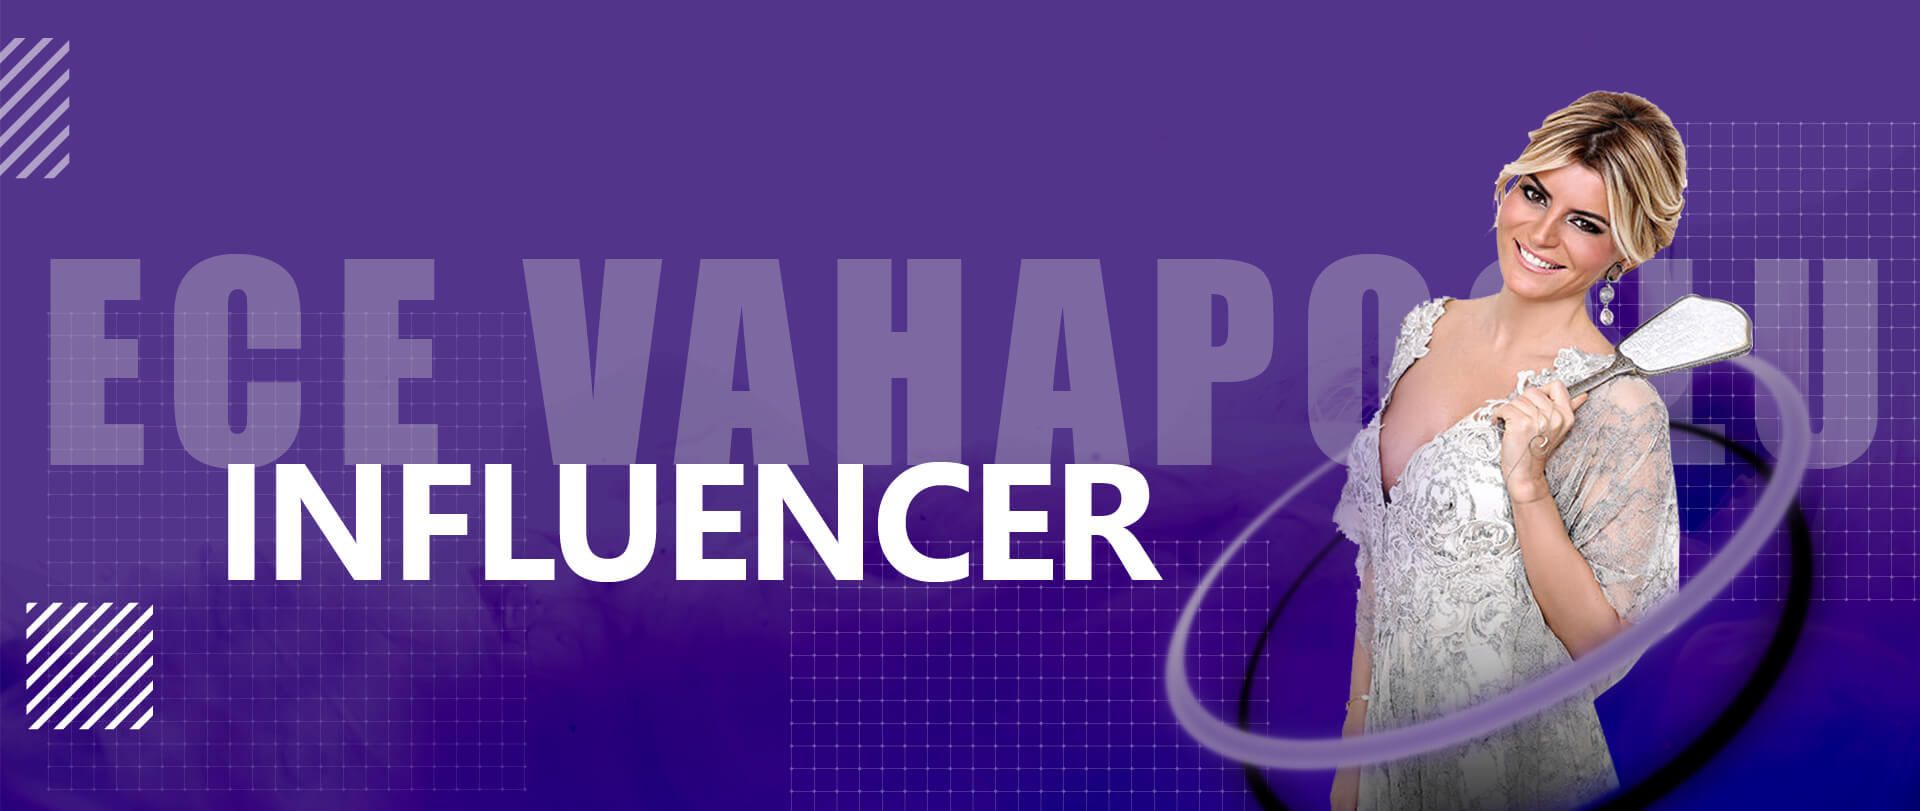 influencer ece vahapoglu